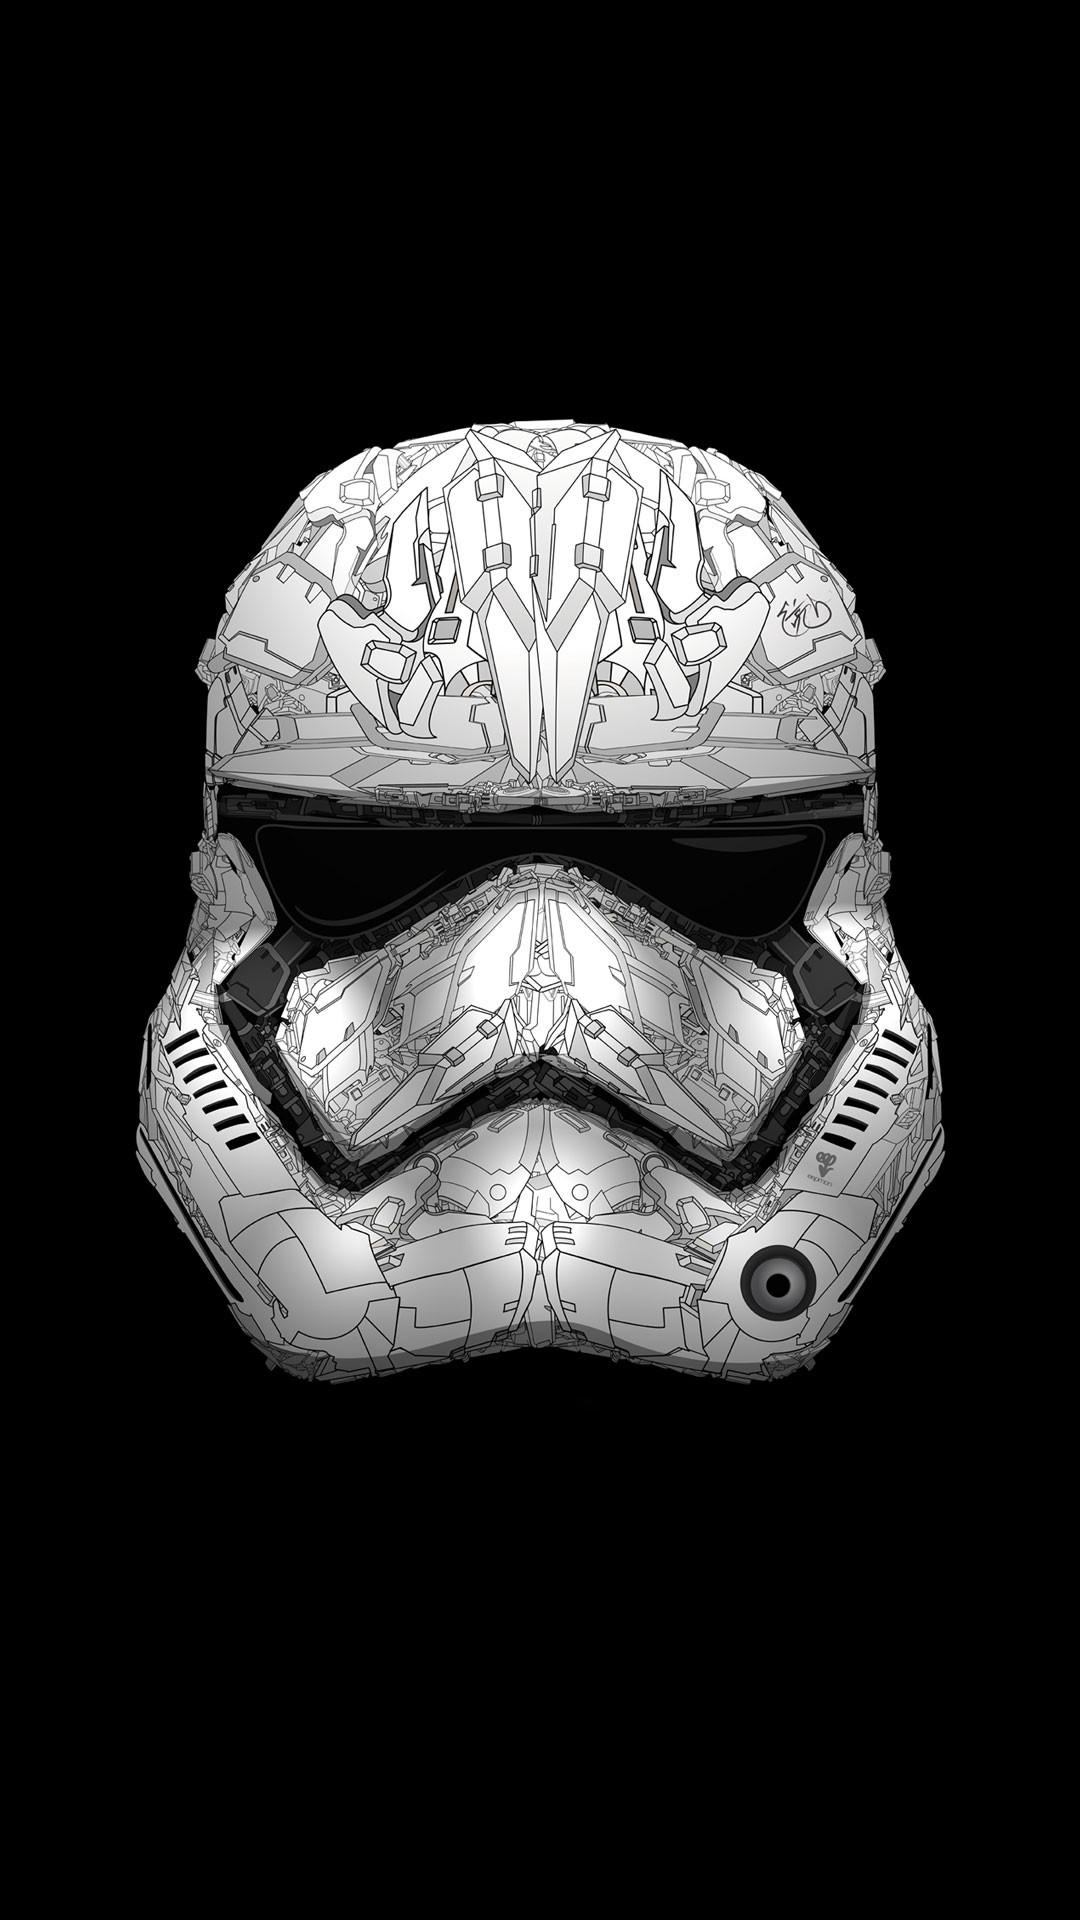 Free Download Star Wars iPhone Wallpaper.